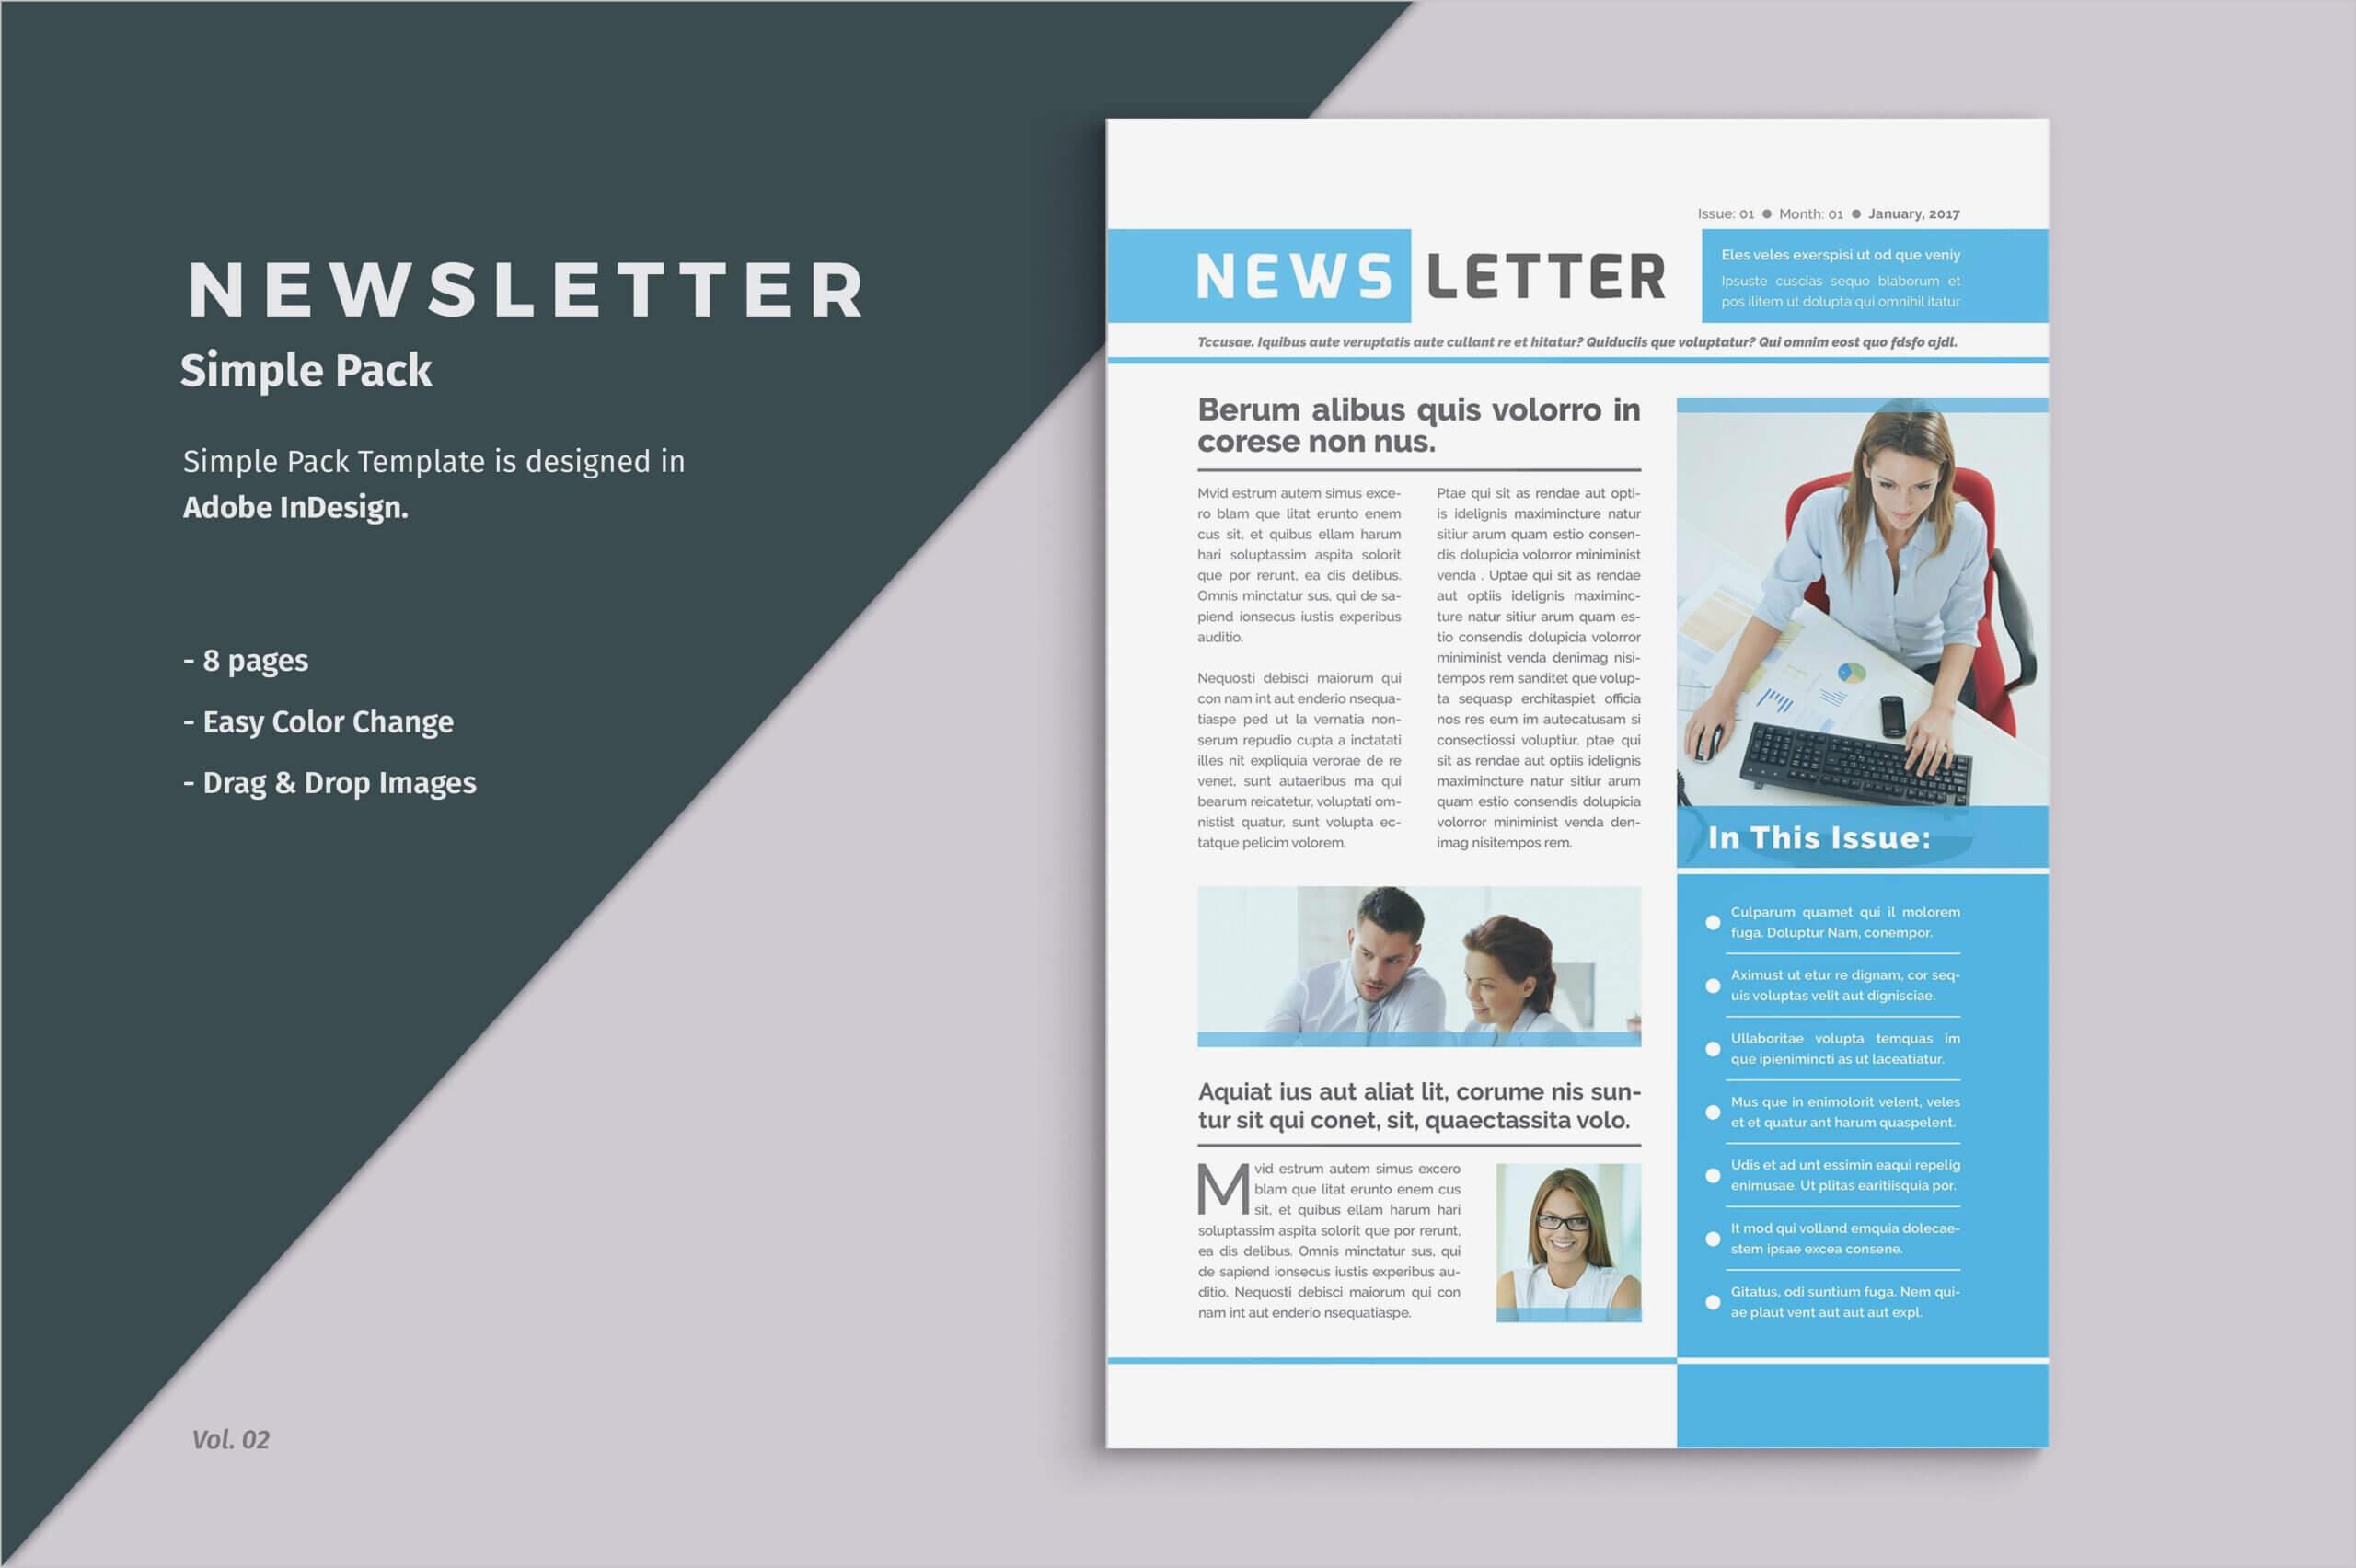 028 Template Ideas Brochure Templates Free Download For Word Regarding Brochure Templates For Word 2007